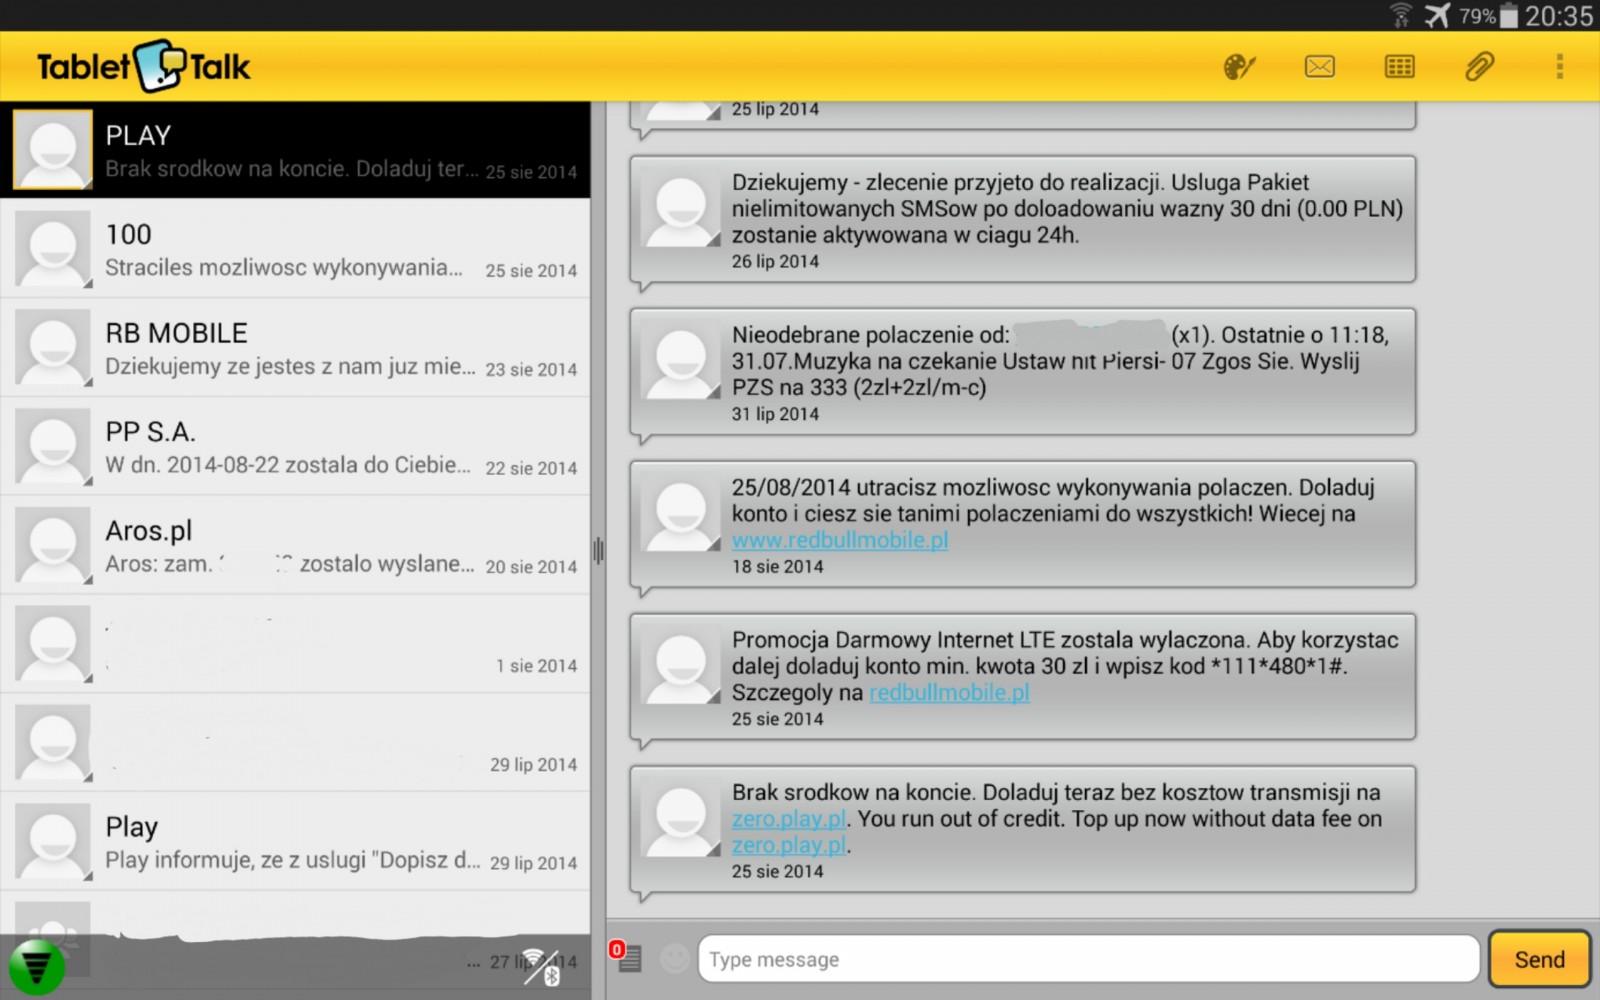 Tablet Talk - Klient / fot. galaktyczny.pl